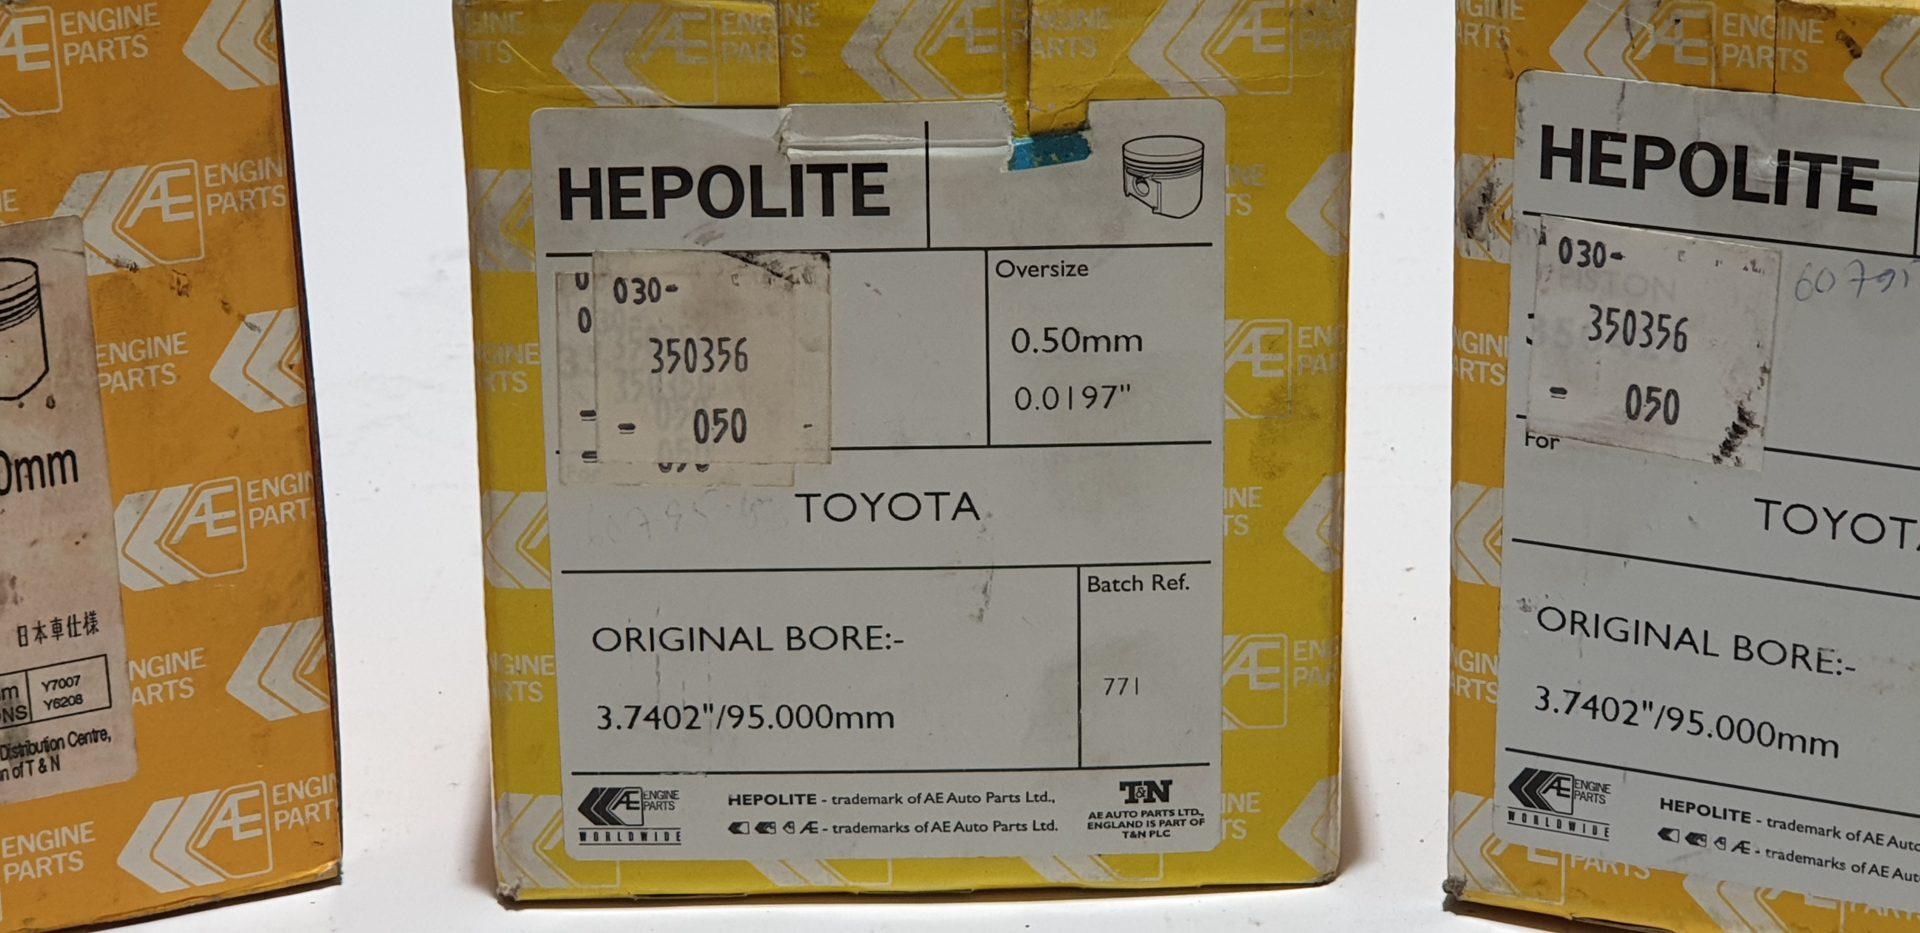 toyota 030-350356-050 +0,50mm l